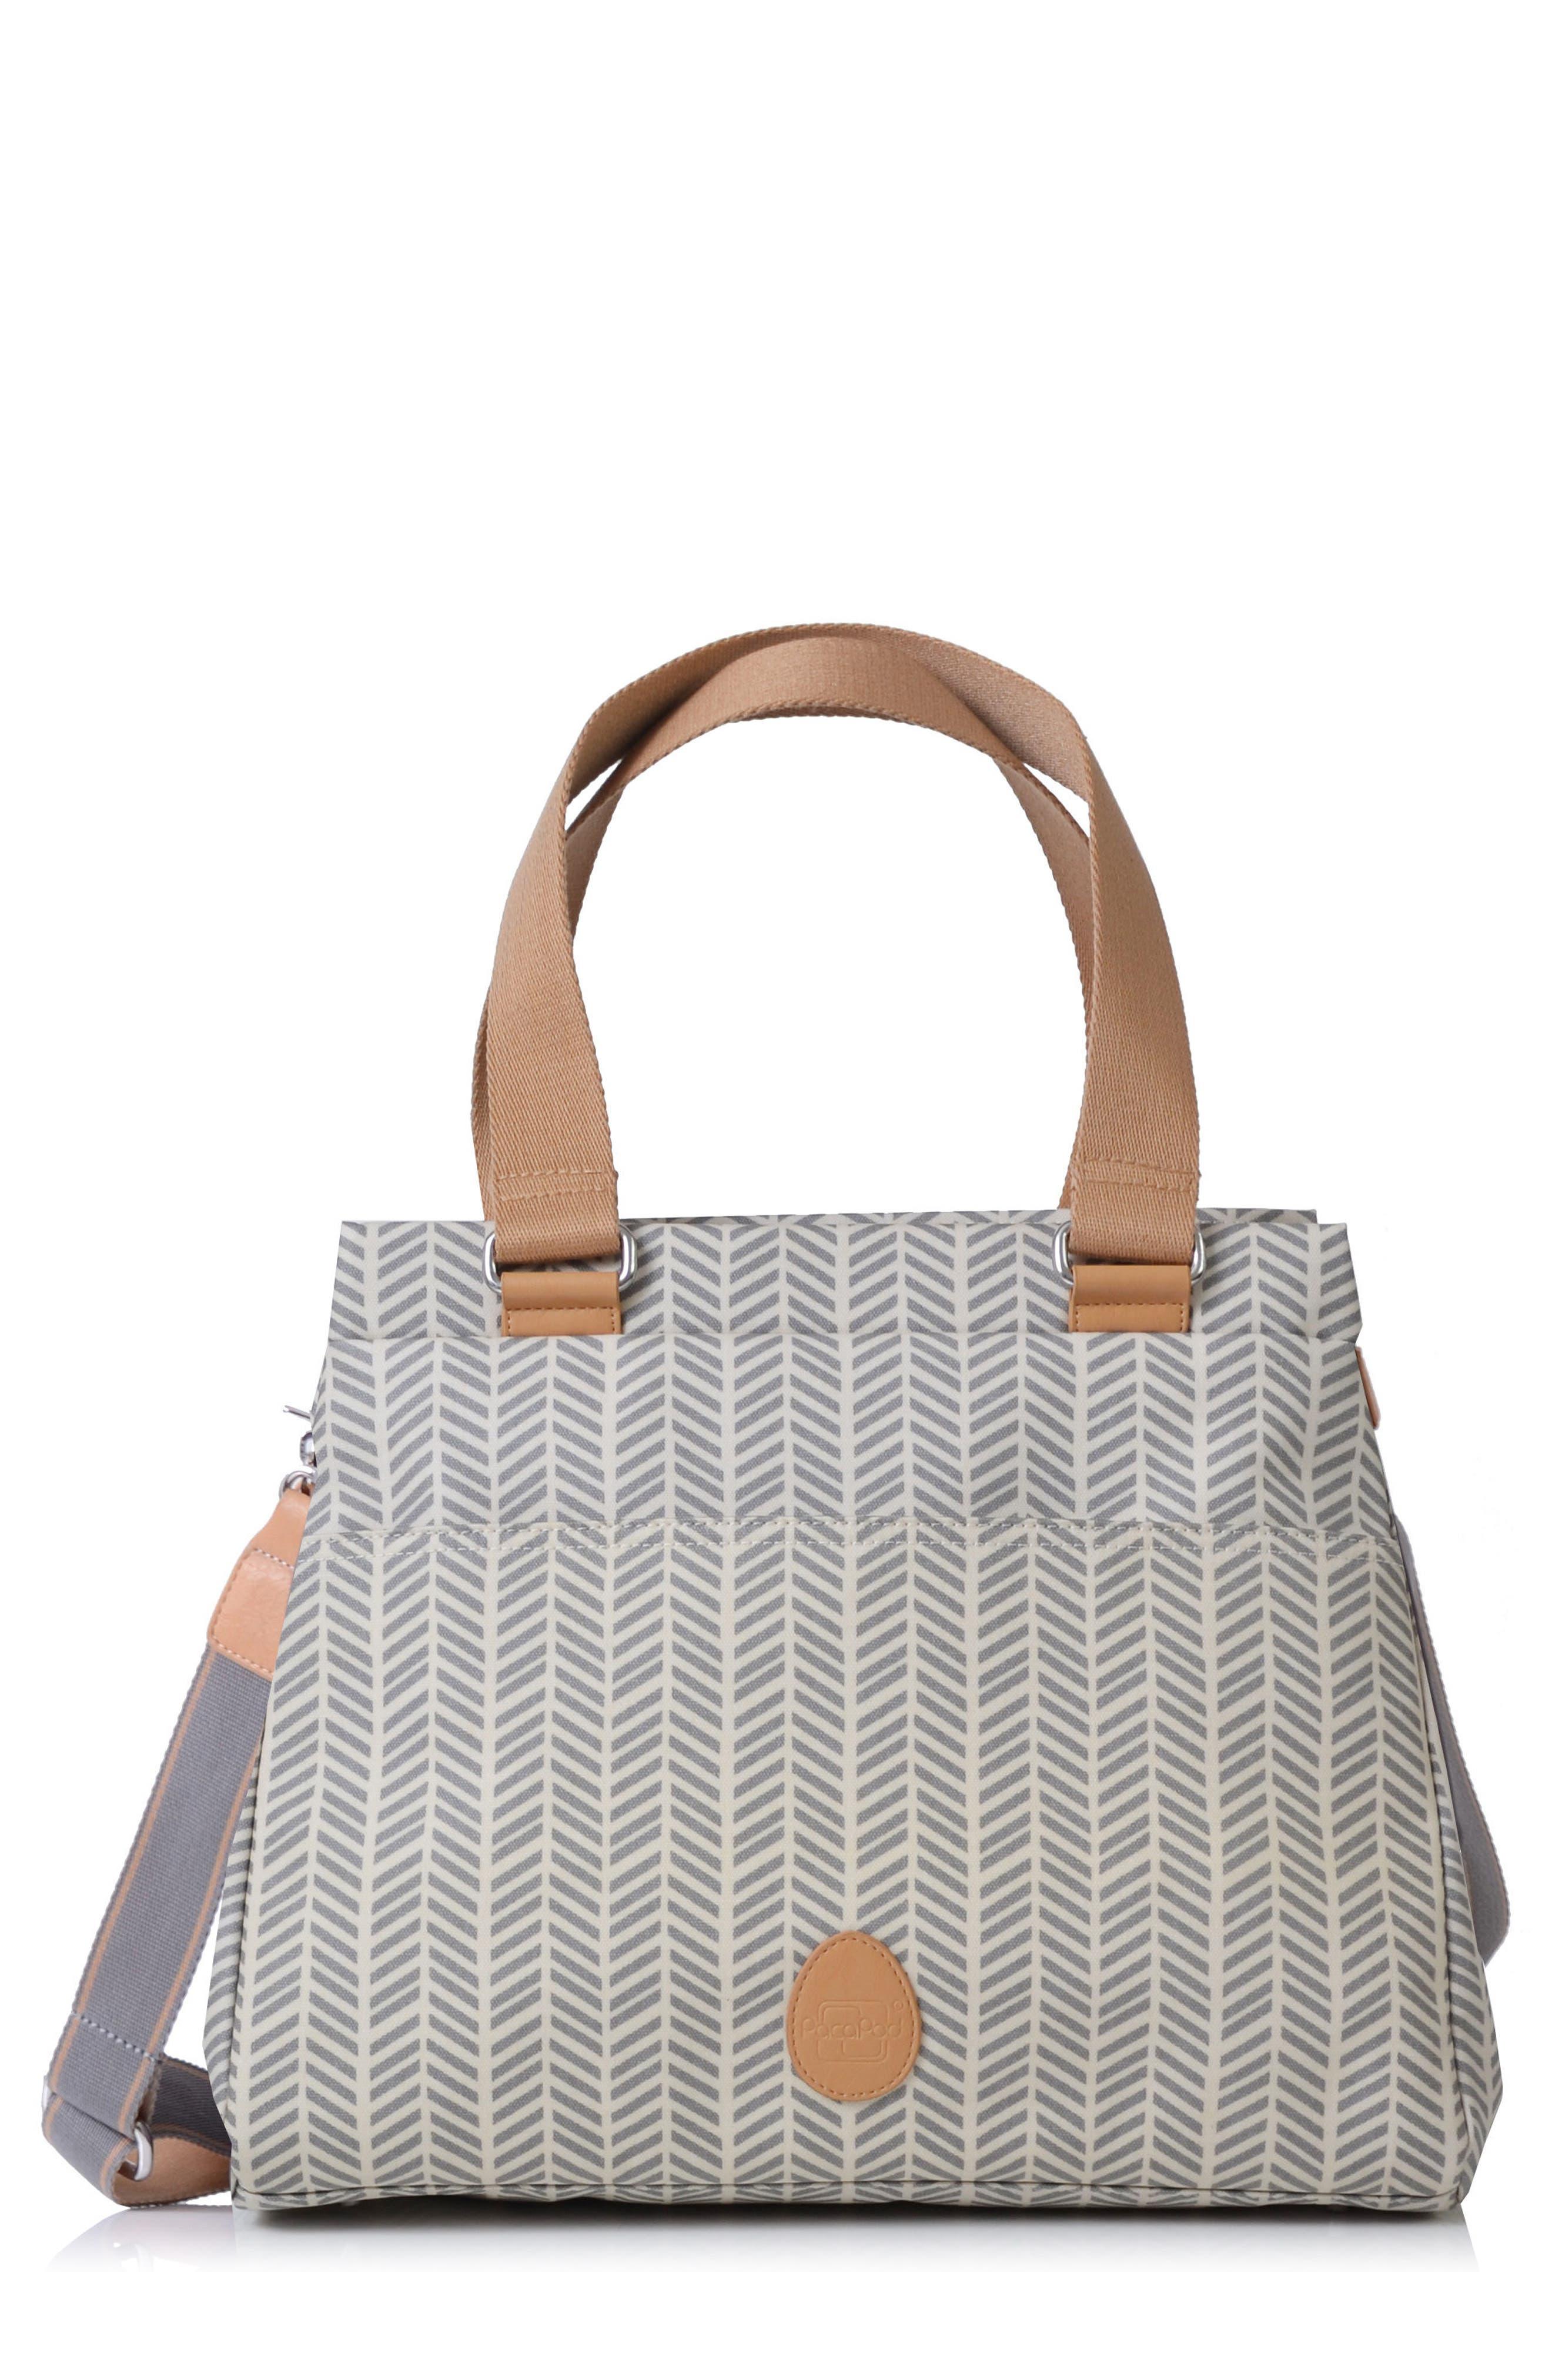 Main Image - PacaPod 'Richmond' Diaper Bag